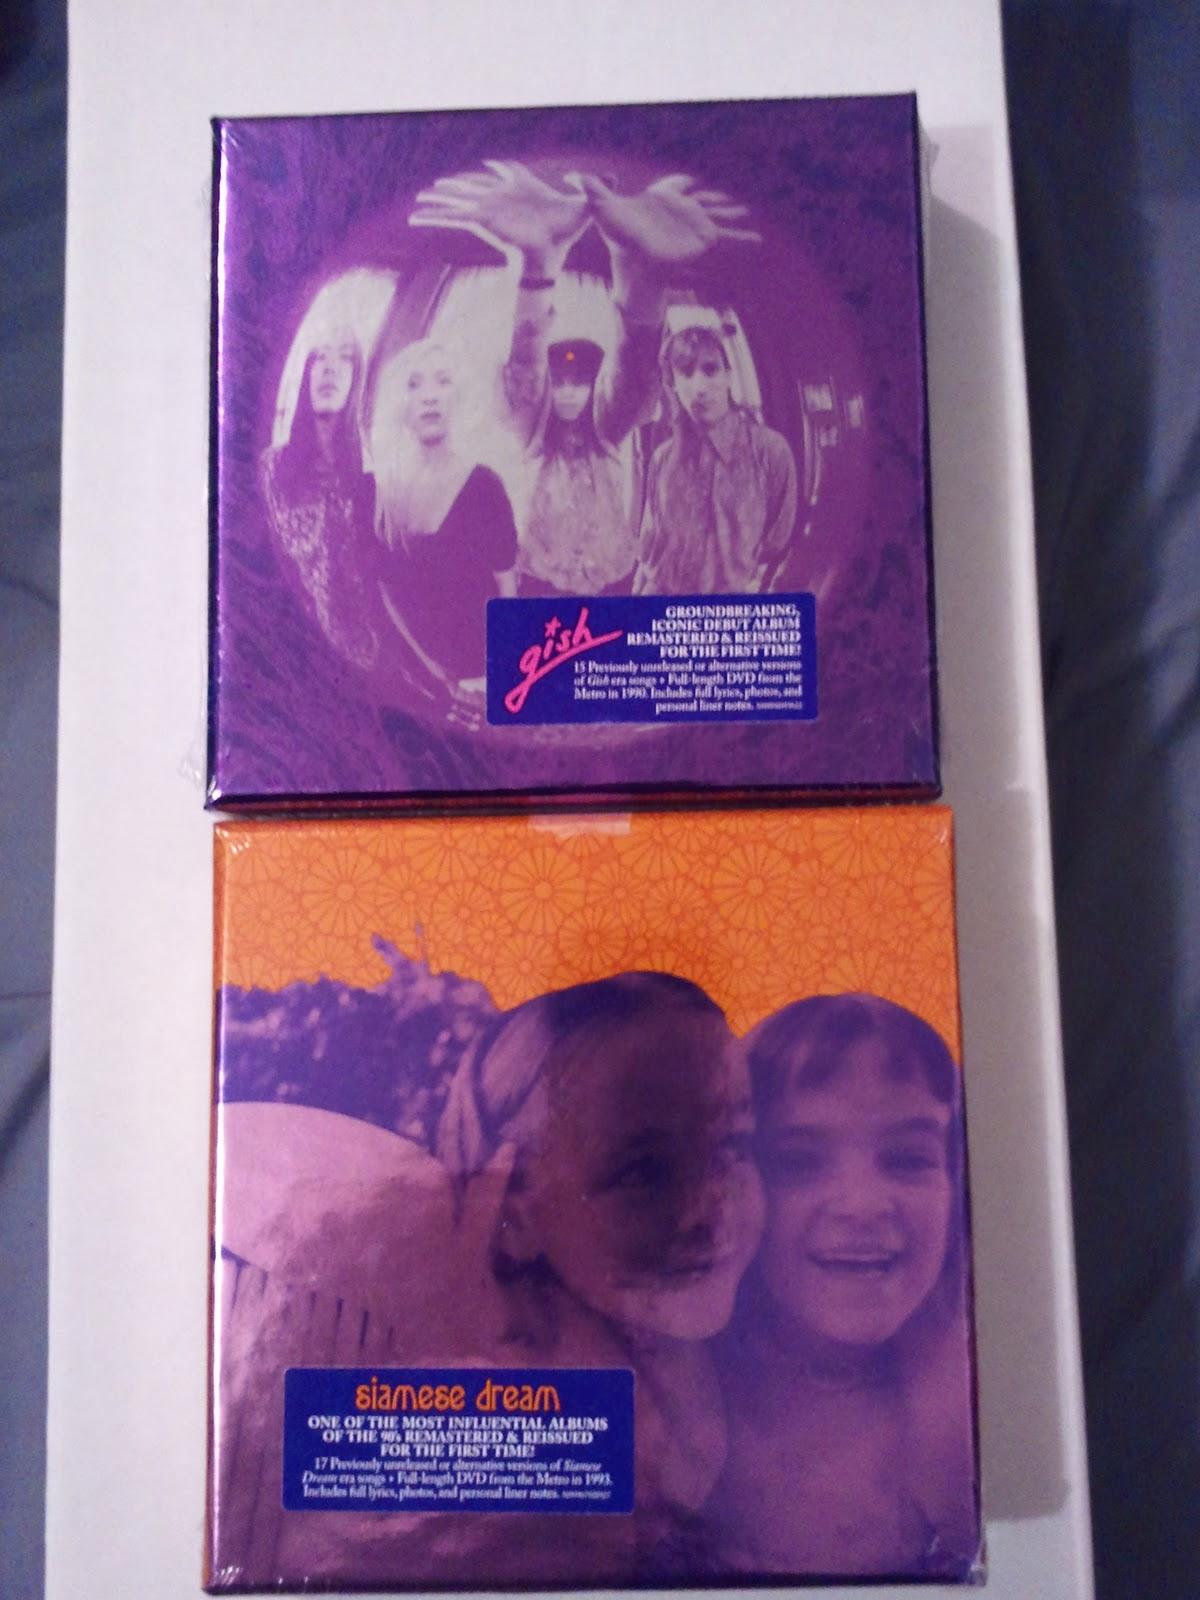 100 Siamese Dream Smashing Pumpkins Full Album  : 2011 12 02173220 from stwoolf.com size 1200 x 1600 jpeg 206kB